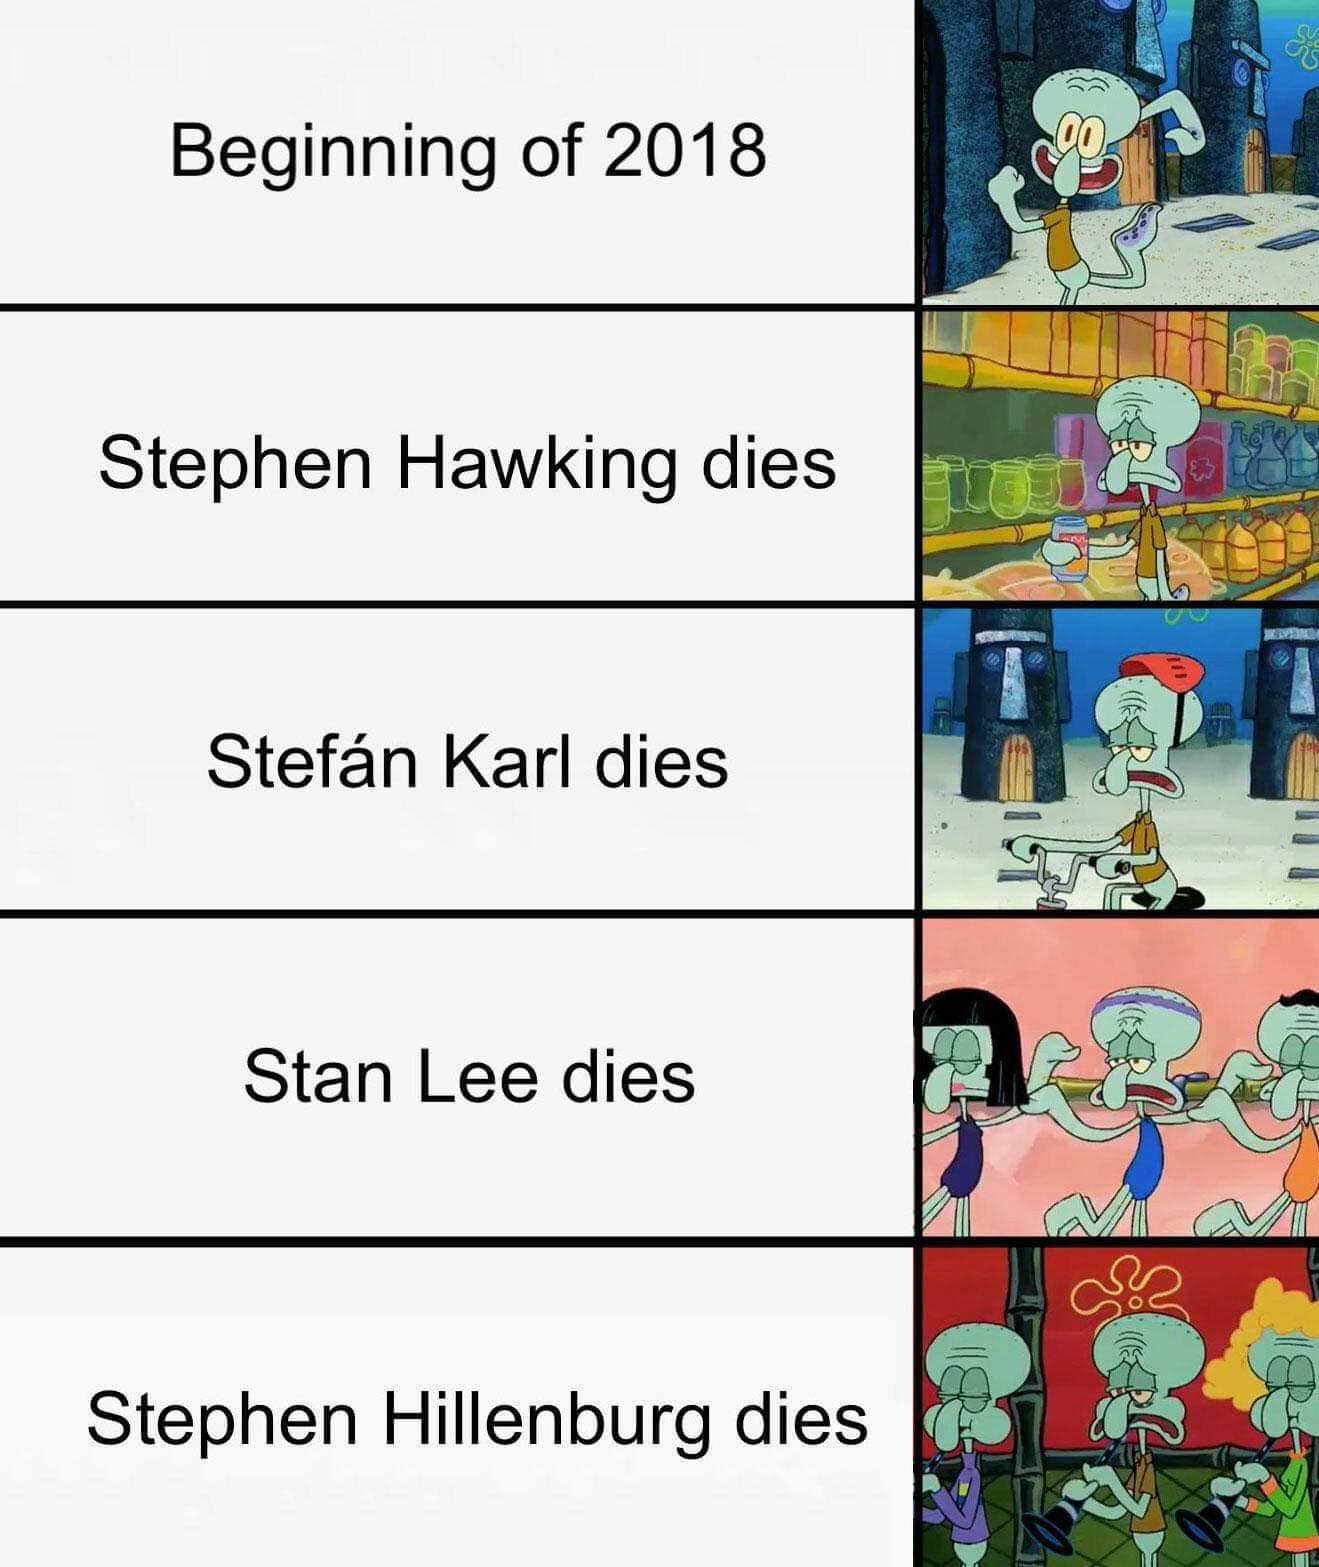 Is this 2016 version 2? - meme